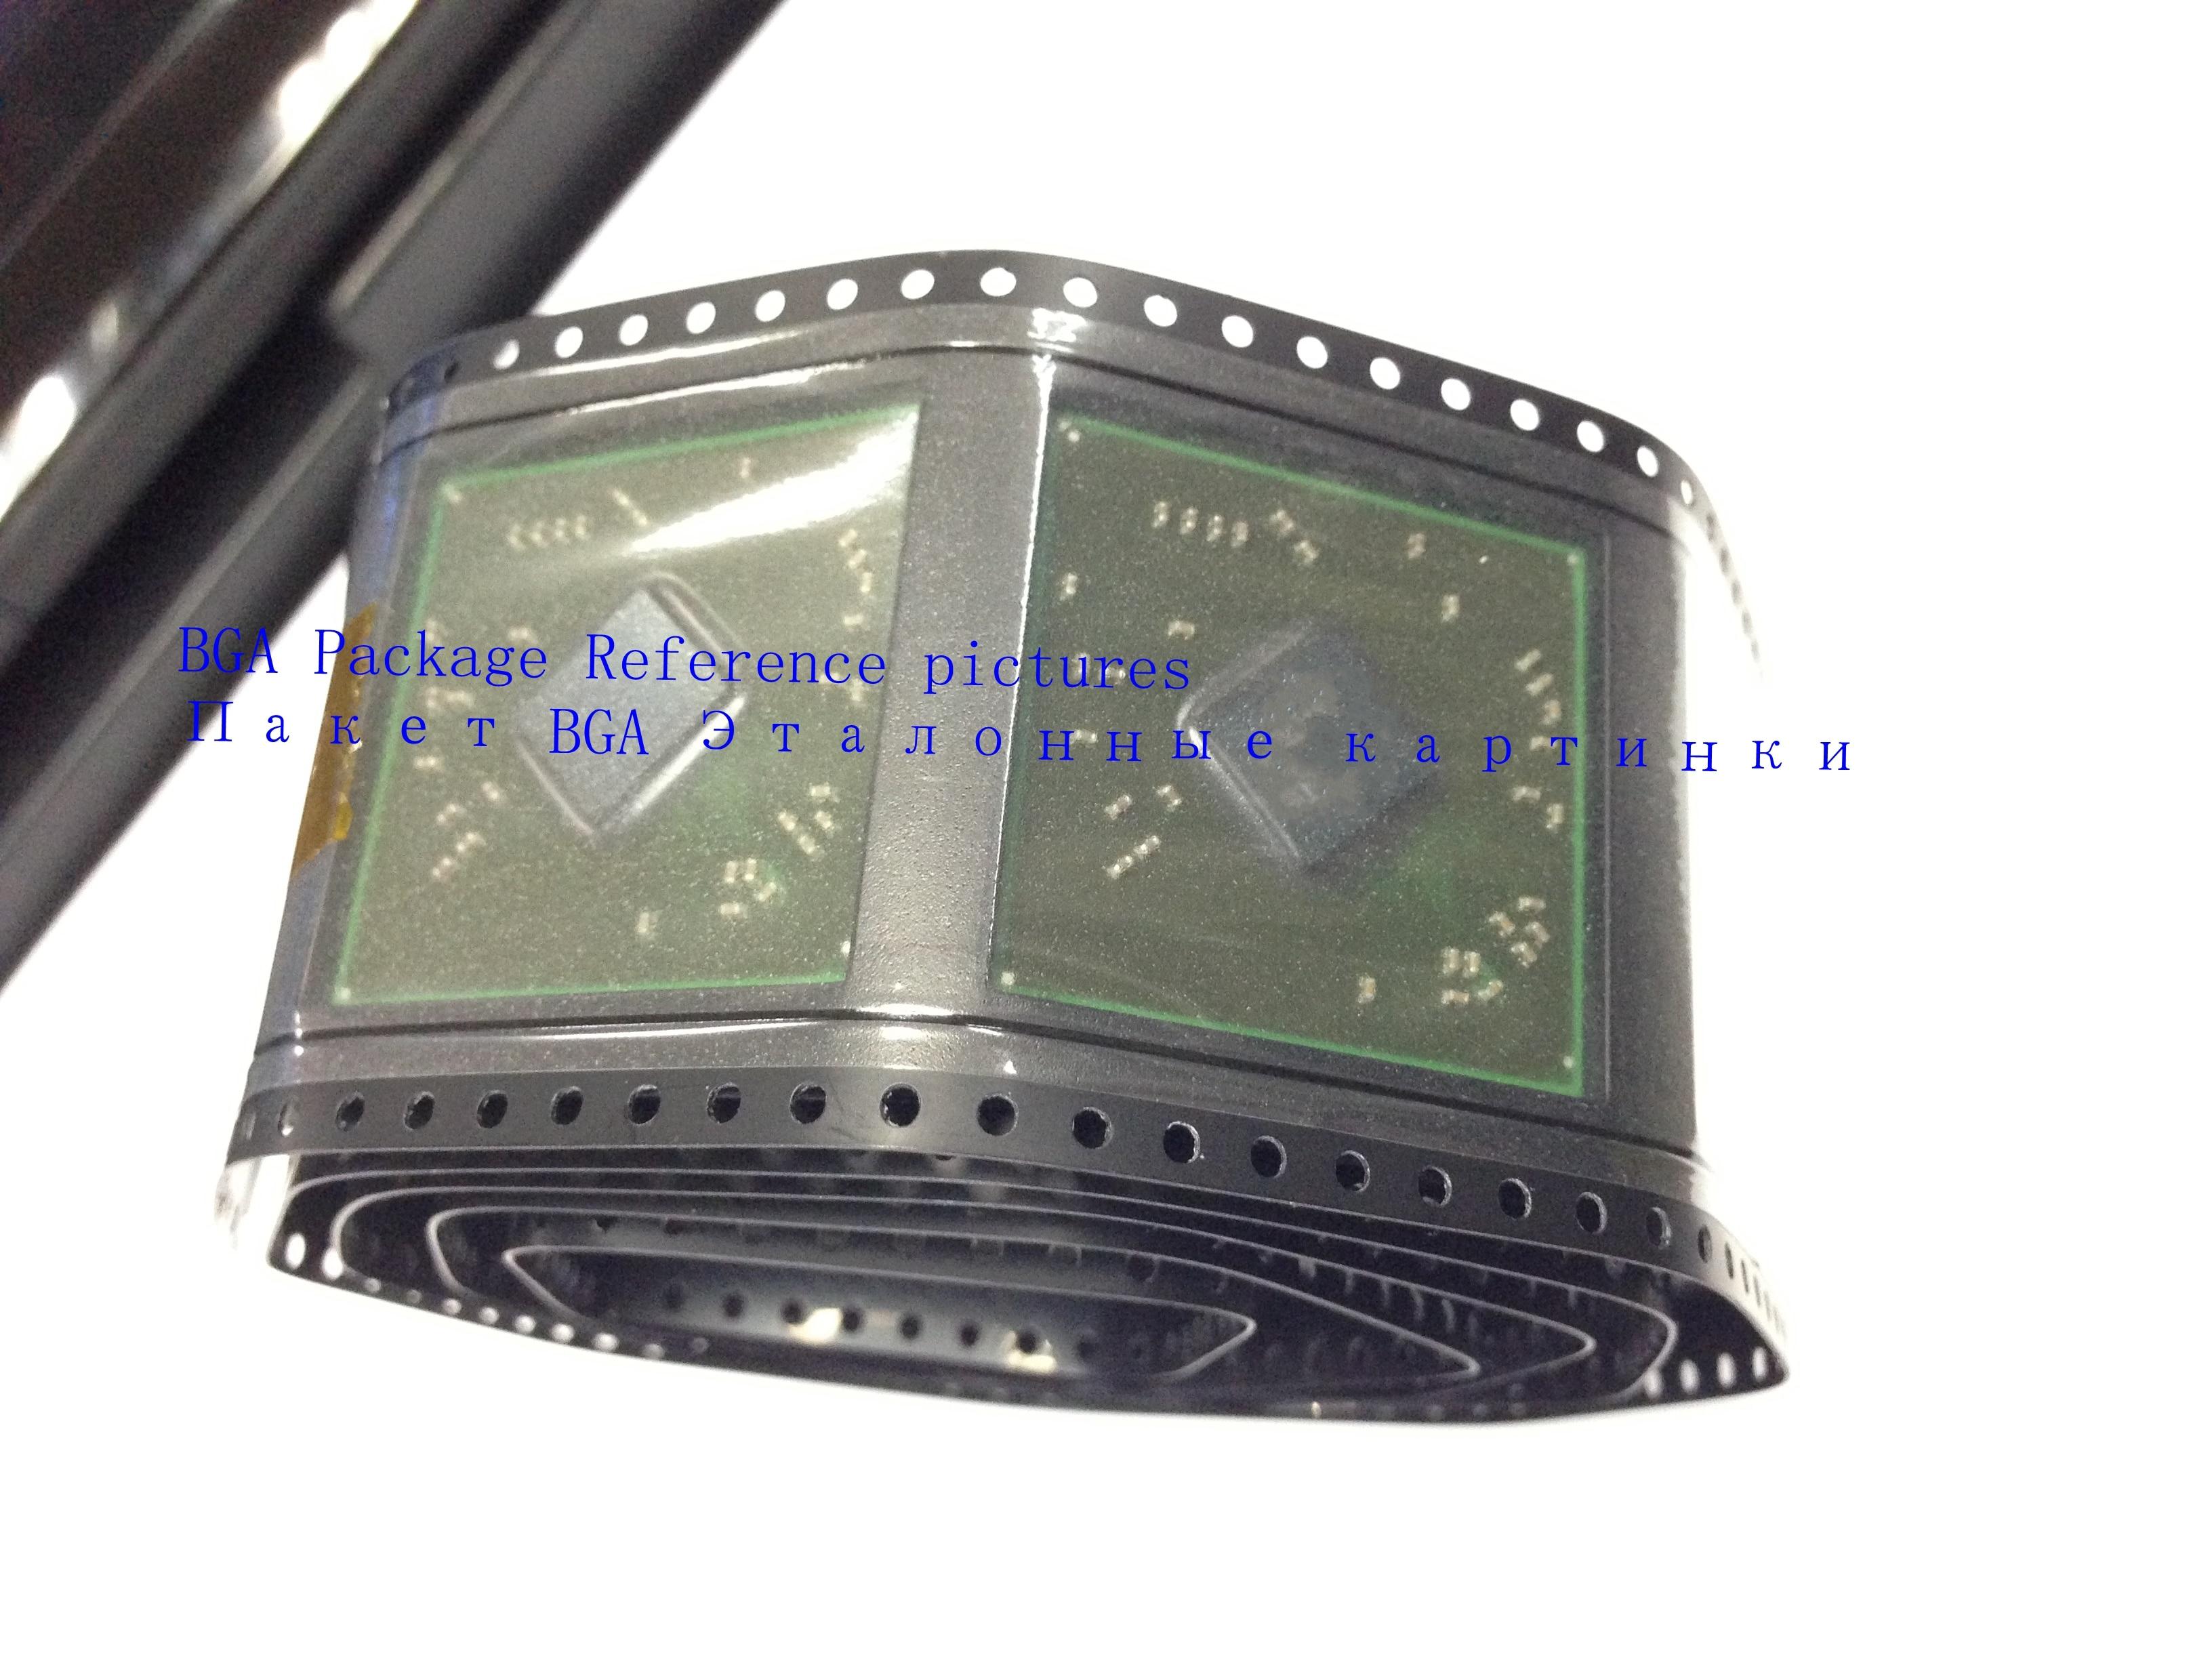 1 pcs/lot 100% nouveau 2117U SR0VQ SROVQ BGA Chipset1 pcs/lot 100% nouveau 2117U SR0VQ SROVQ BGA Chipset